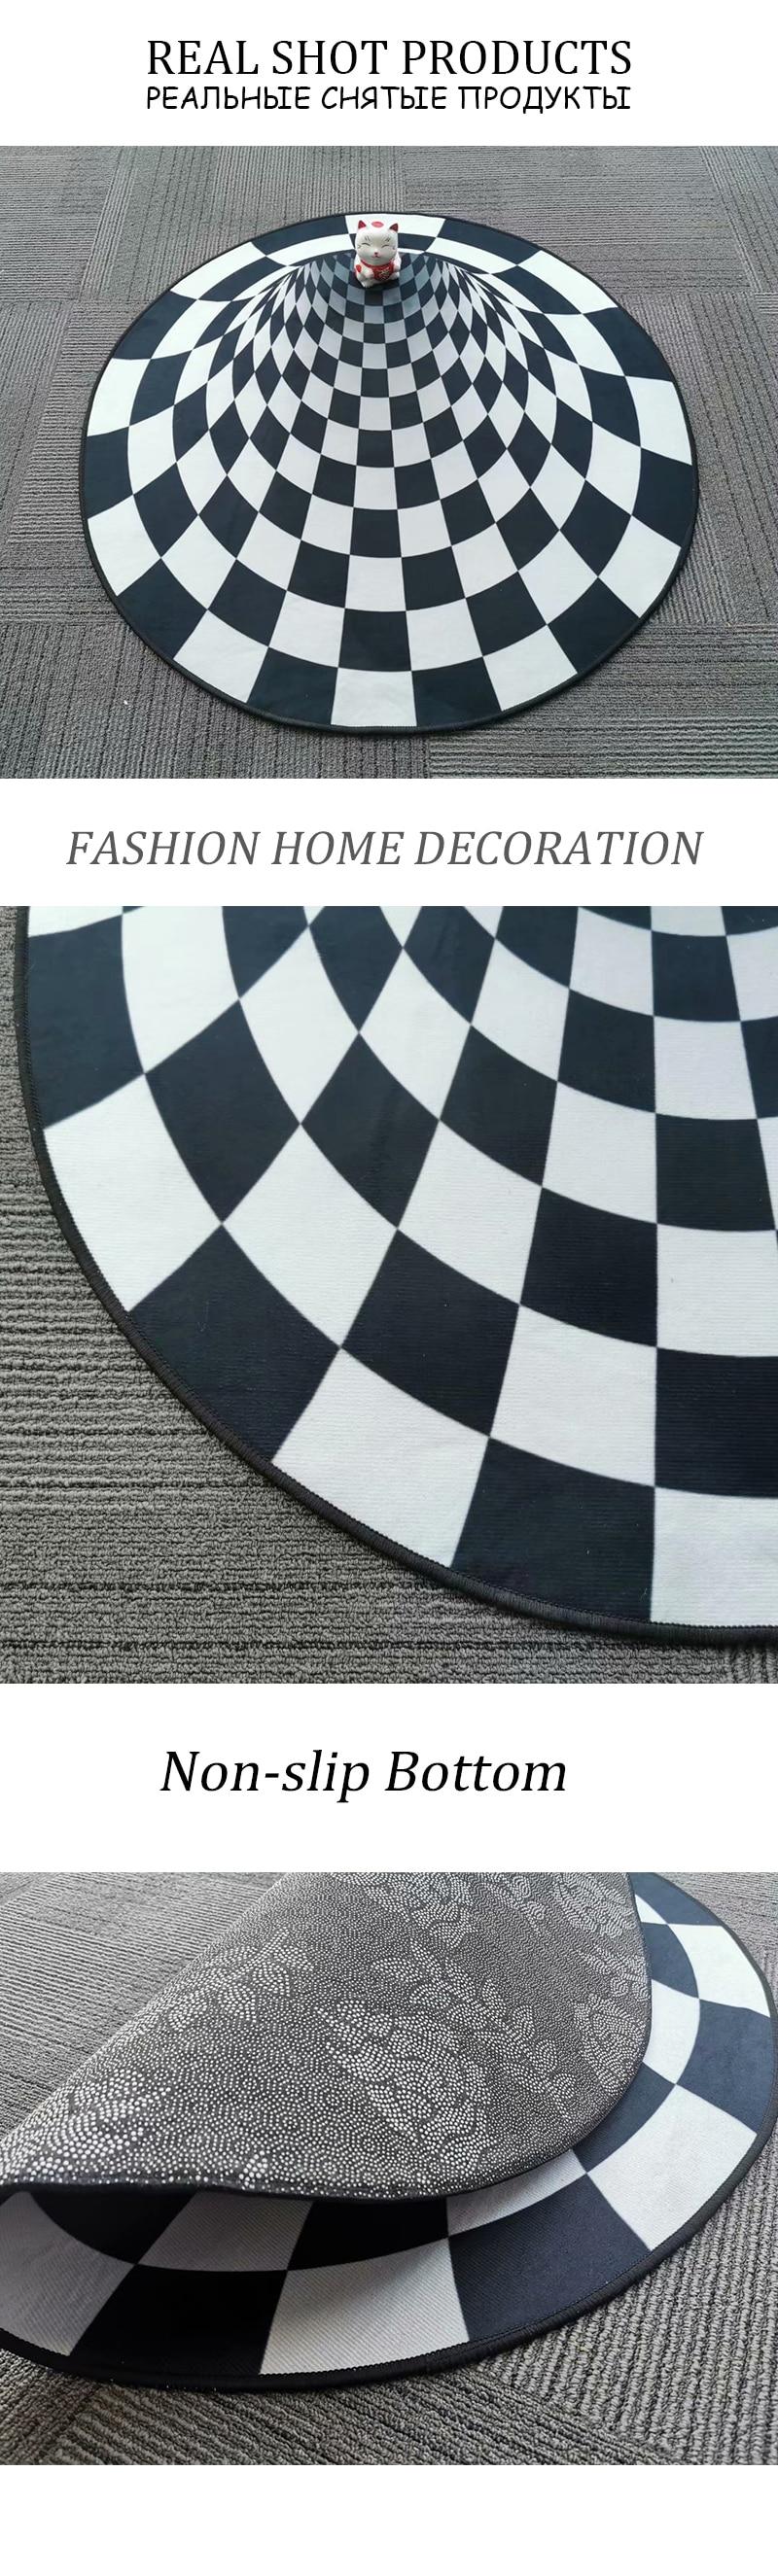 Bubble Kiss 2020 New 3D Round Carpet Vortex Illusion Rug Black&White Stereo Vision Mat Living Room Carpet Bedroom Decor Area Rug